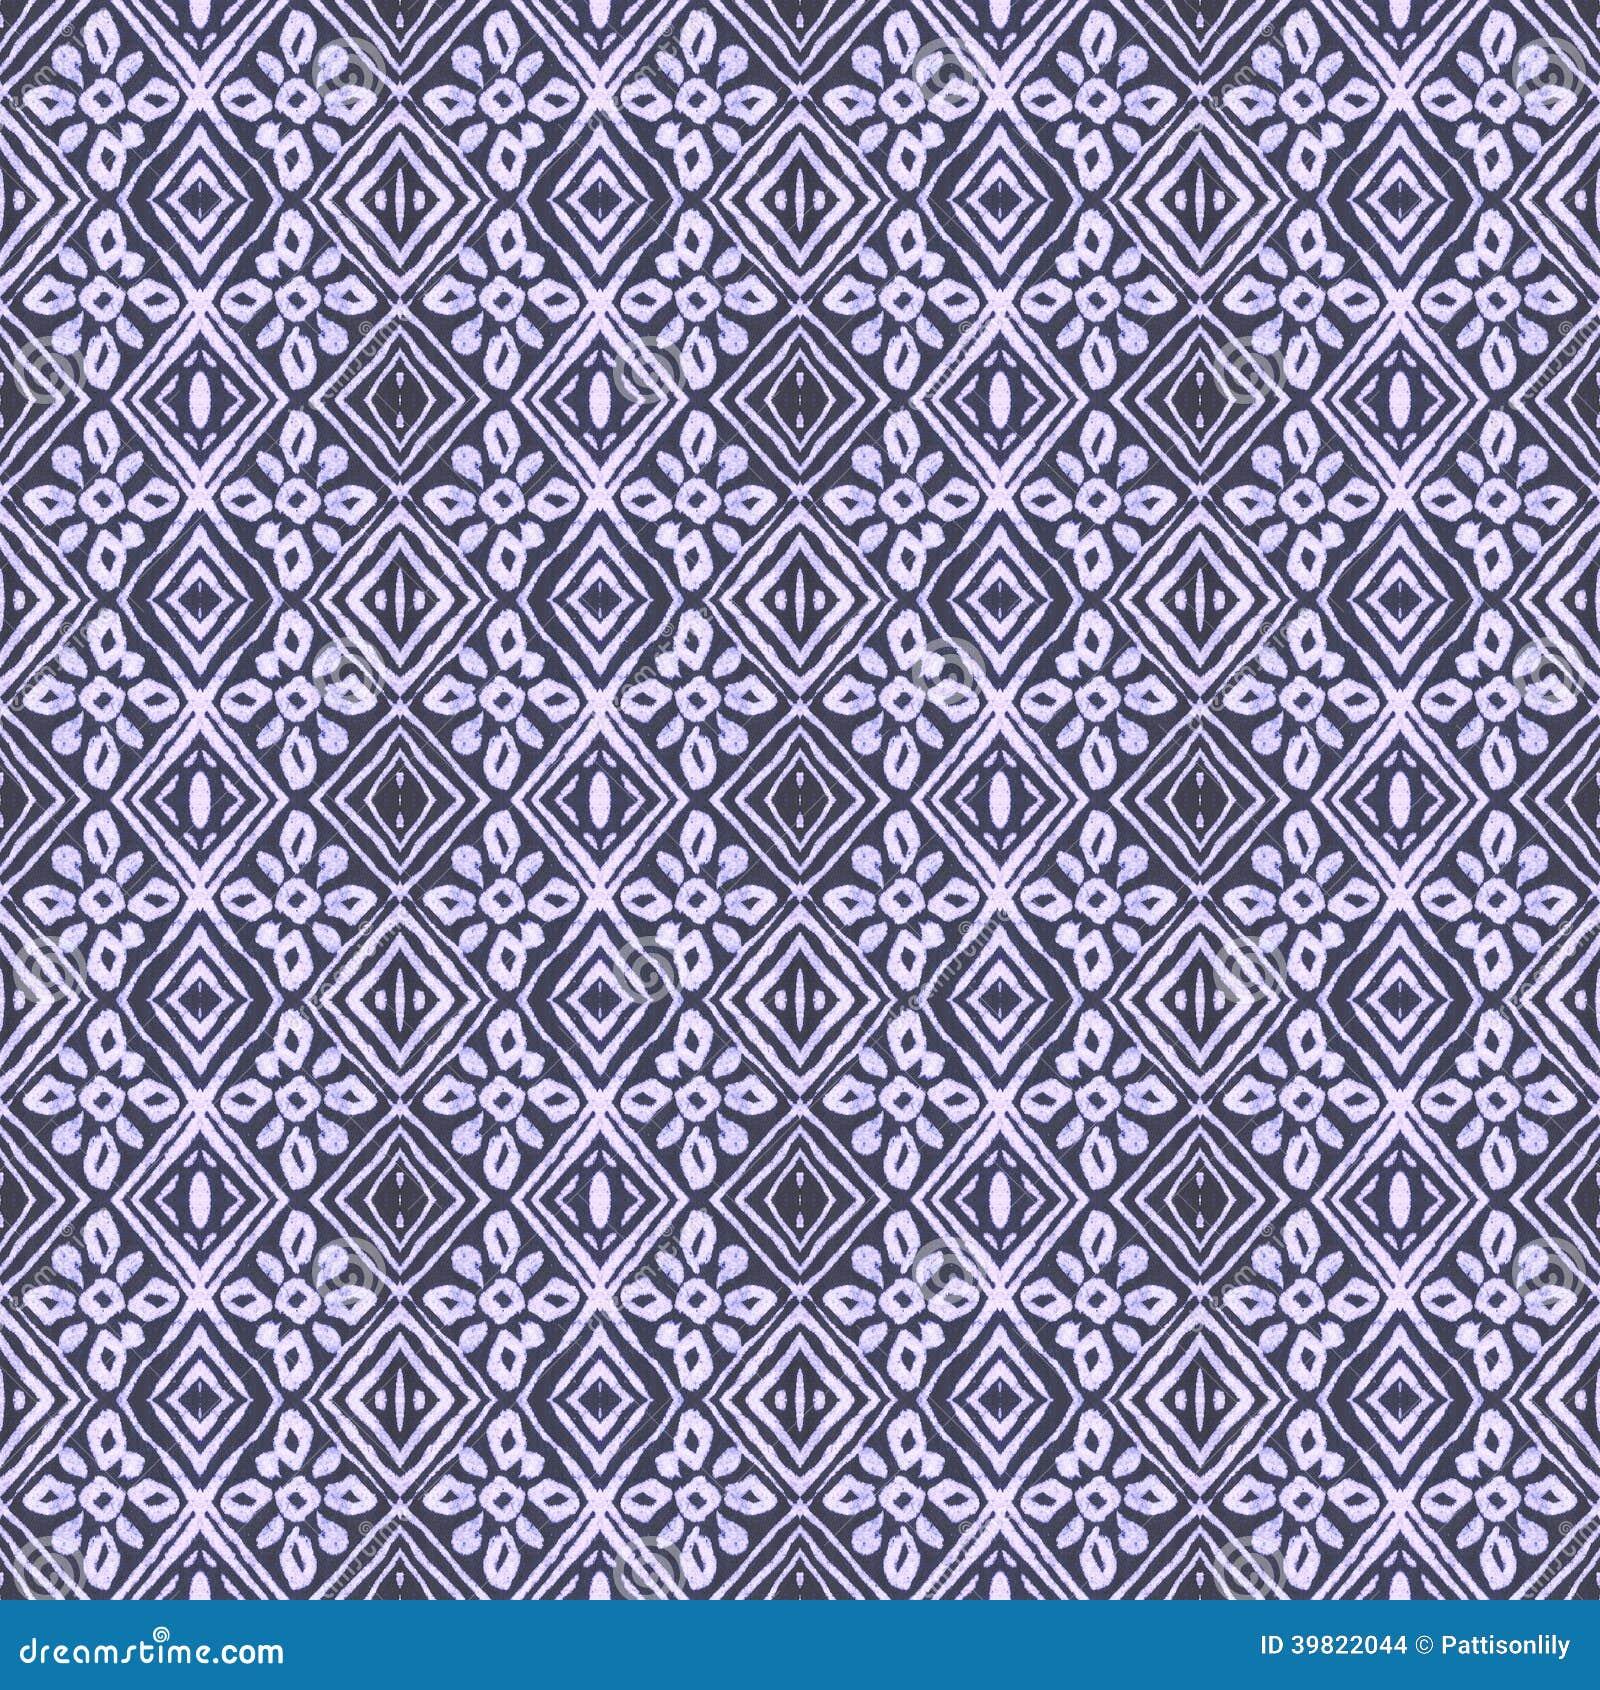 batik stammes fliesen muster stock abbildung bild 39822044. Black Bedroom Furniture Sets. Home Design Ideas